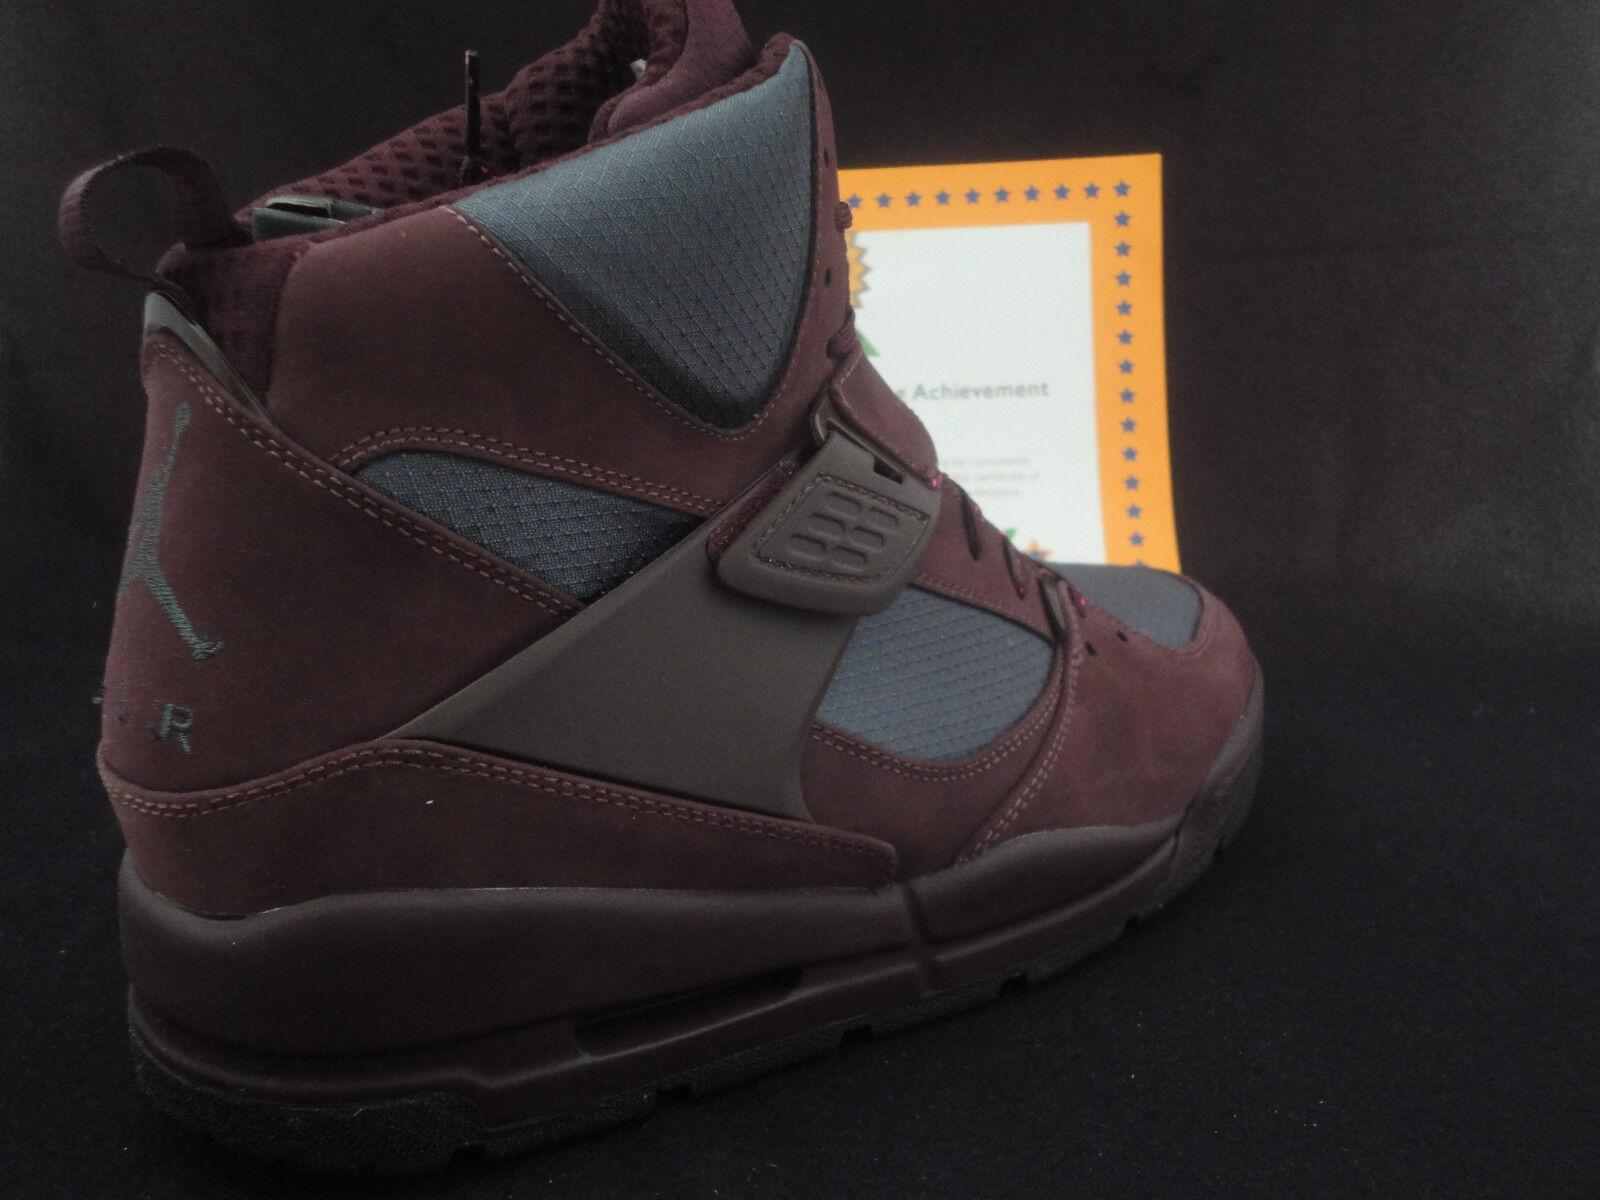 Nike air jordan flug 45 trk, ds trekking, sz - 14, burgunder, 2011 ds trk, spizike stiefel cb3ce0